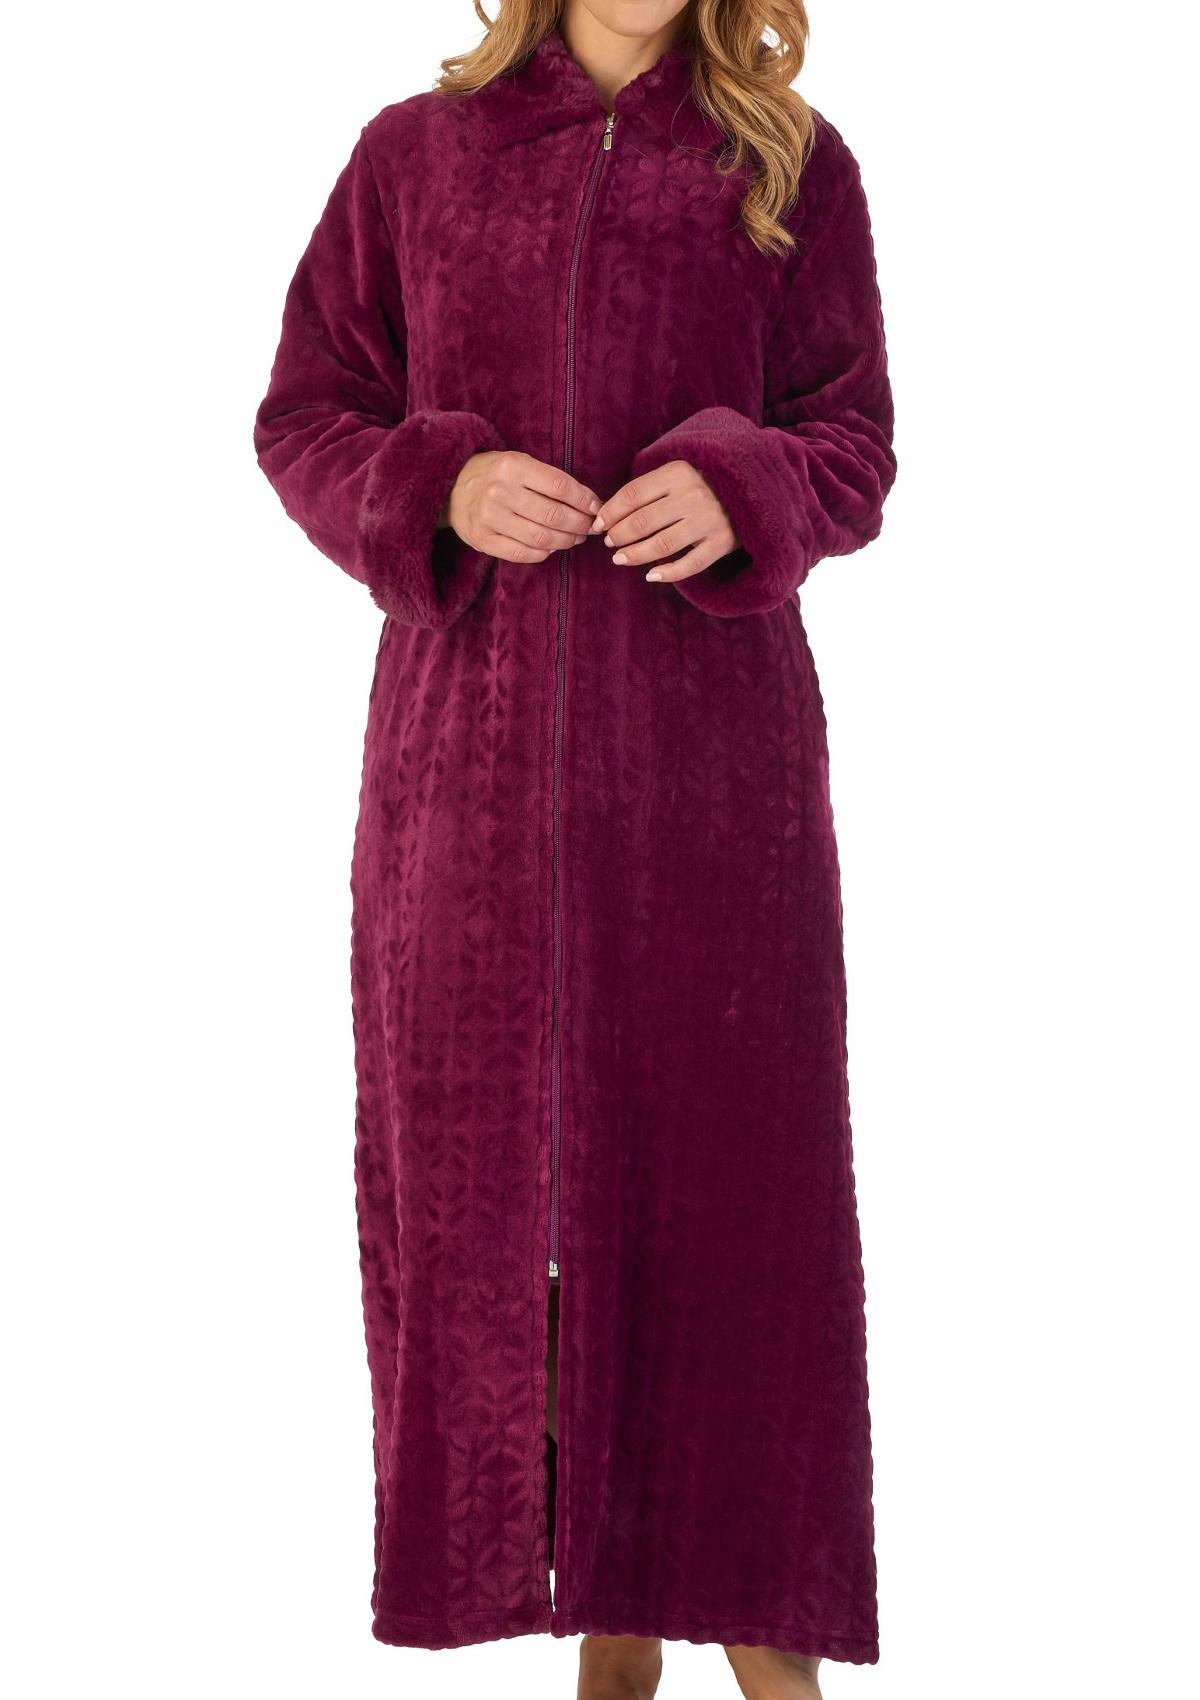 Dressing Gown Ladies Faux Fur Trim Zip Up Fleecy Bathrobe